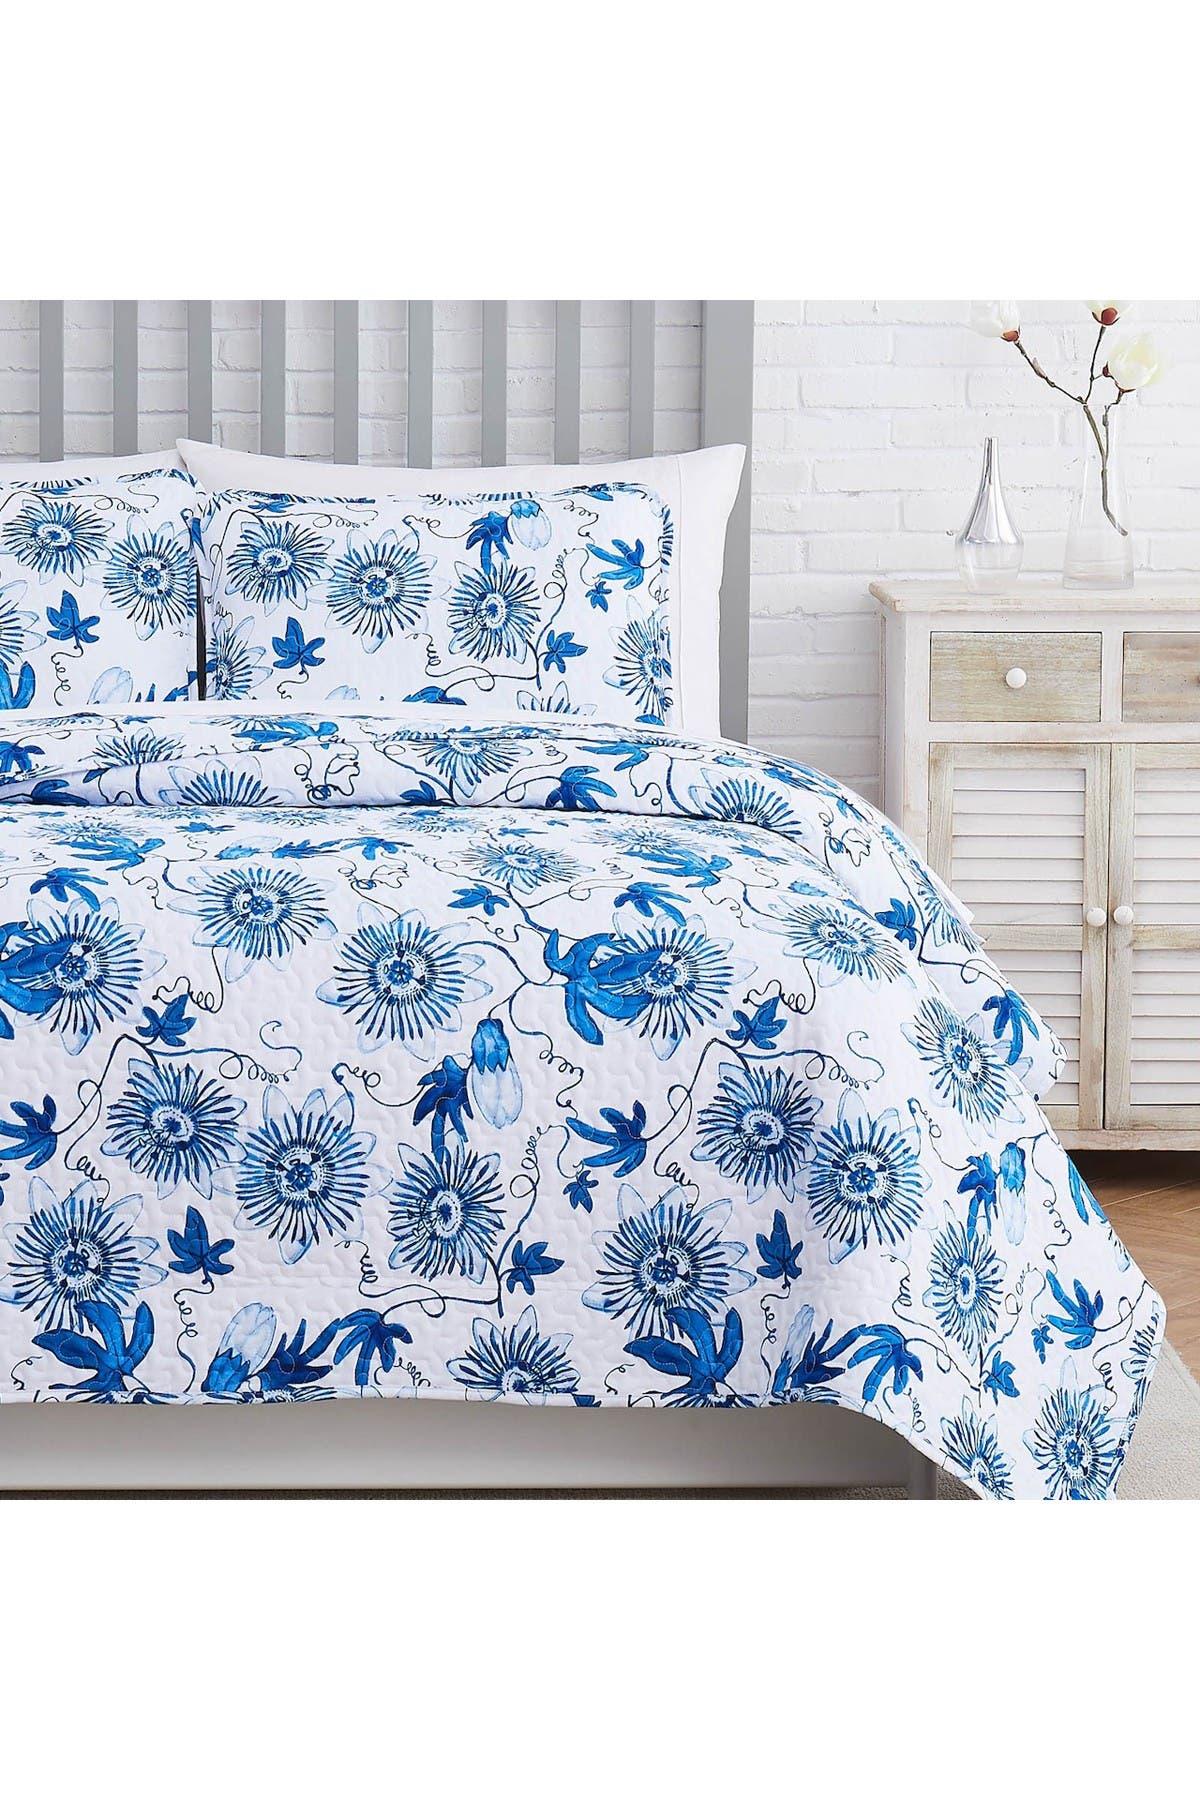 Image of SOUTHSHORE FINE LINENS Floral Joy Oversized Quilt Cover Set - Blue - Full/Queen